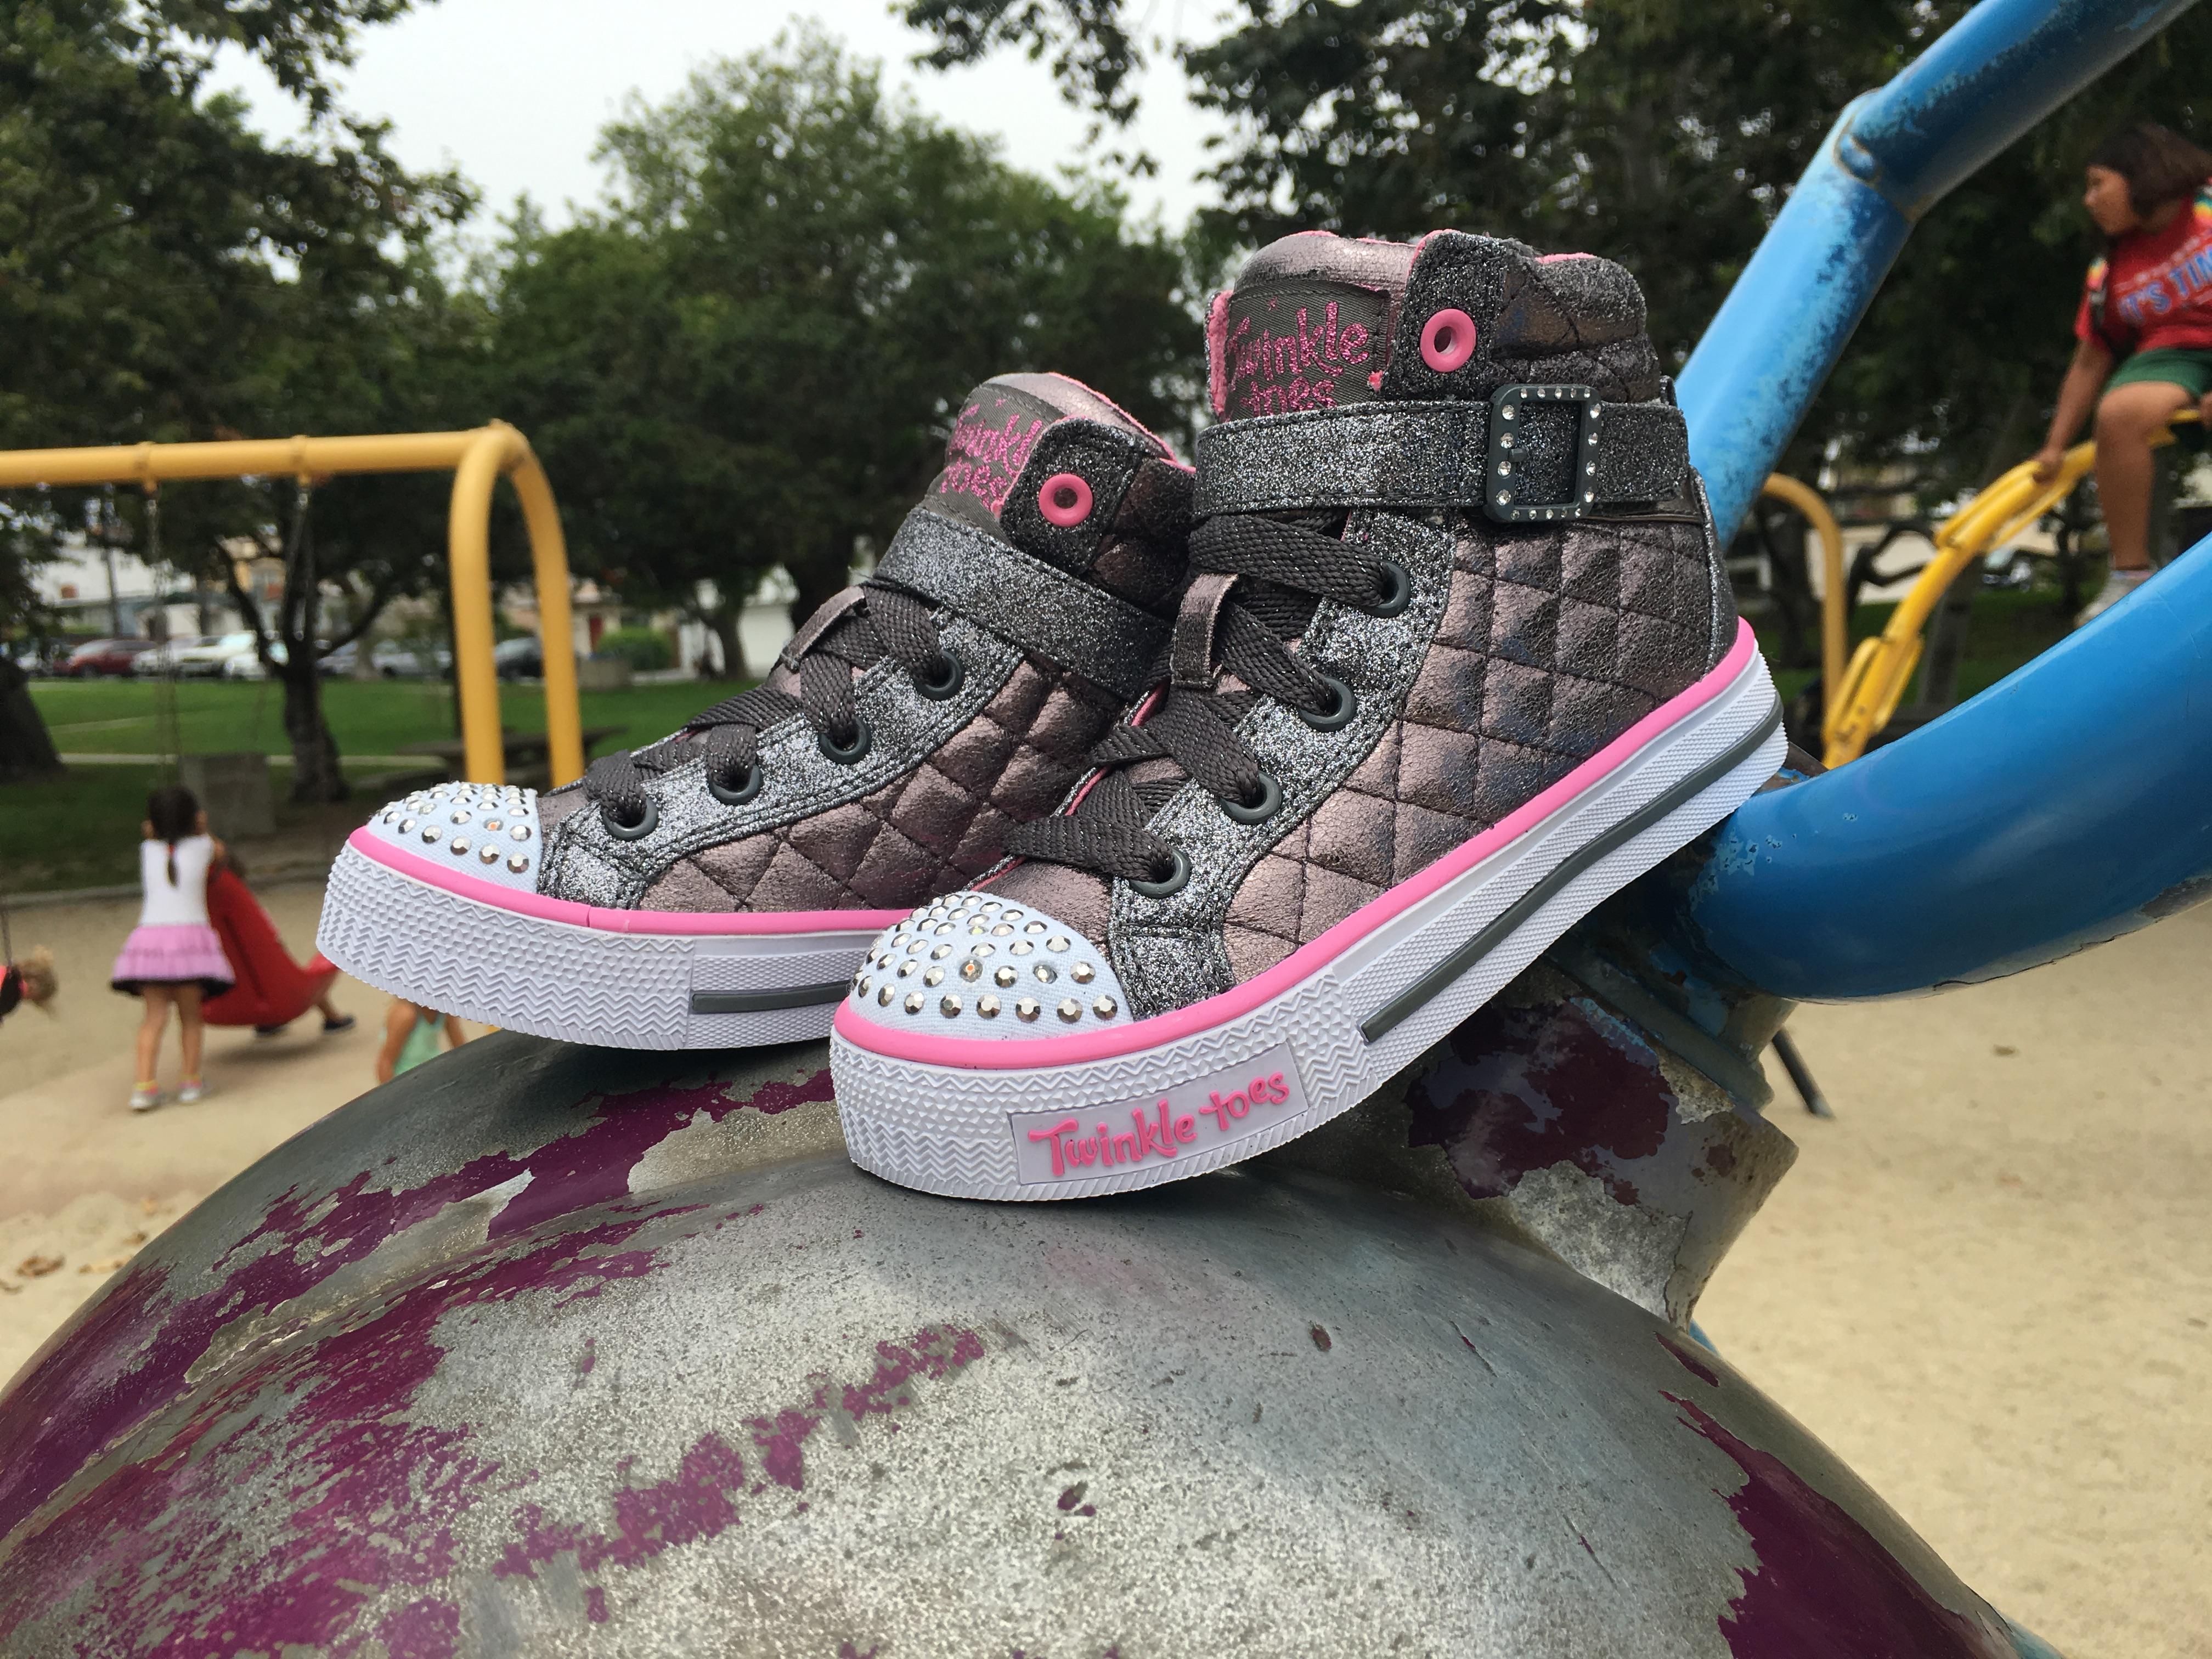 10643N Twinkle Toes Glamslam-Lil Lovelies Boots 26R Girls Toddlers Skechers